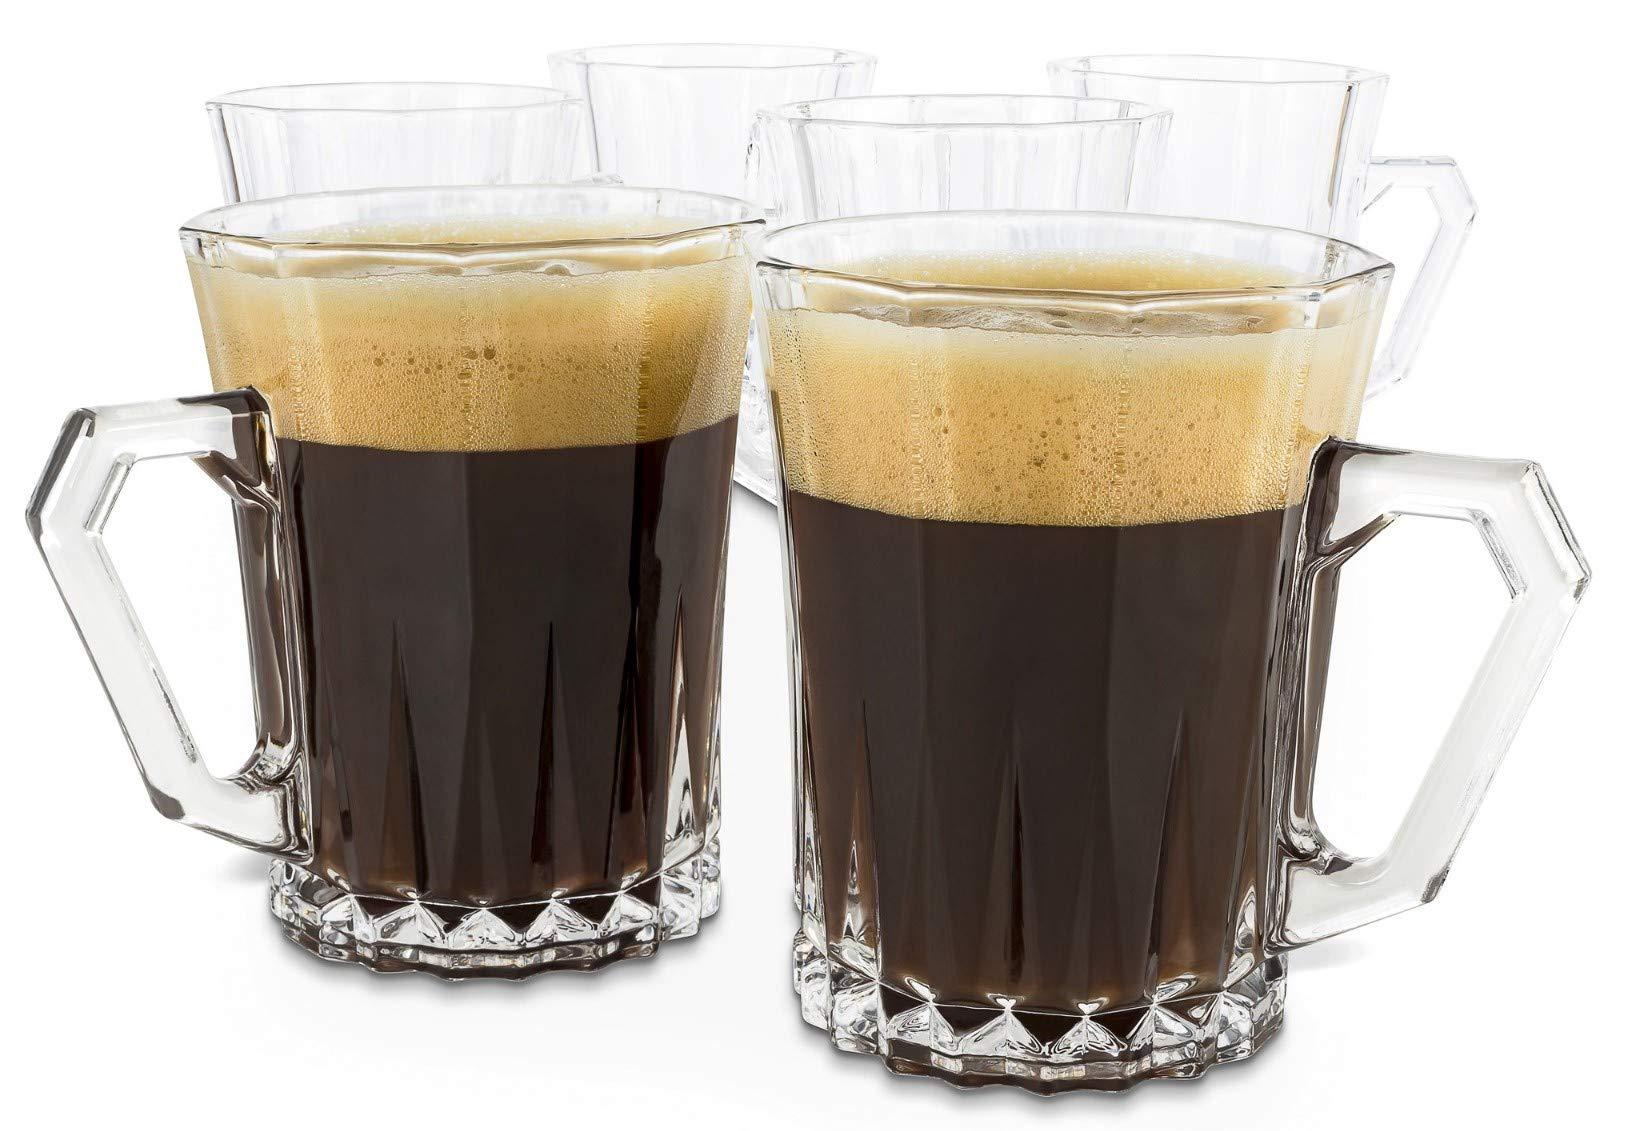 Bezrat Luxury Cappuccino Glass Coffee Tea Cups with Handle [Set of 6] Tempered Glass Espresso Cups - Latte Mugs 9 Ounces Espresso Cappuccino